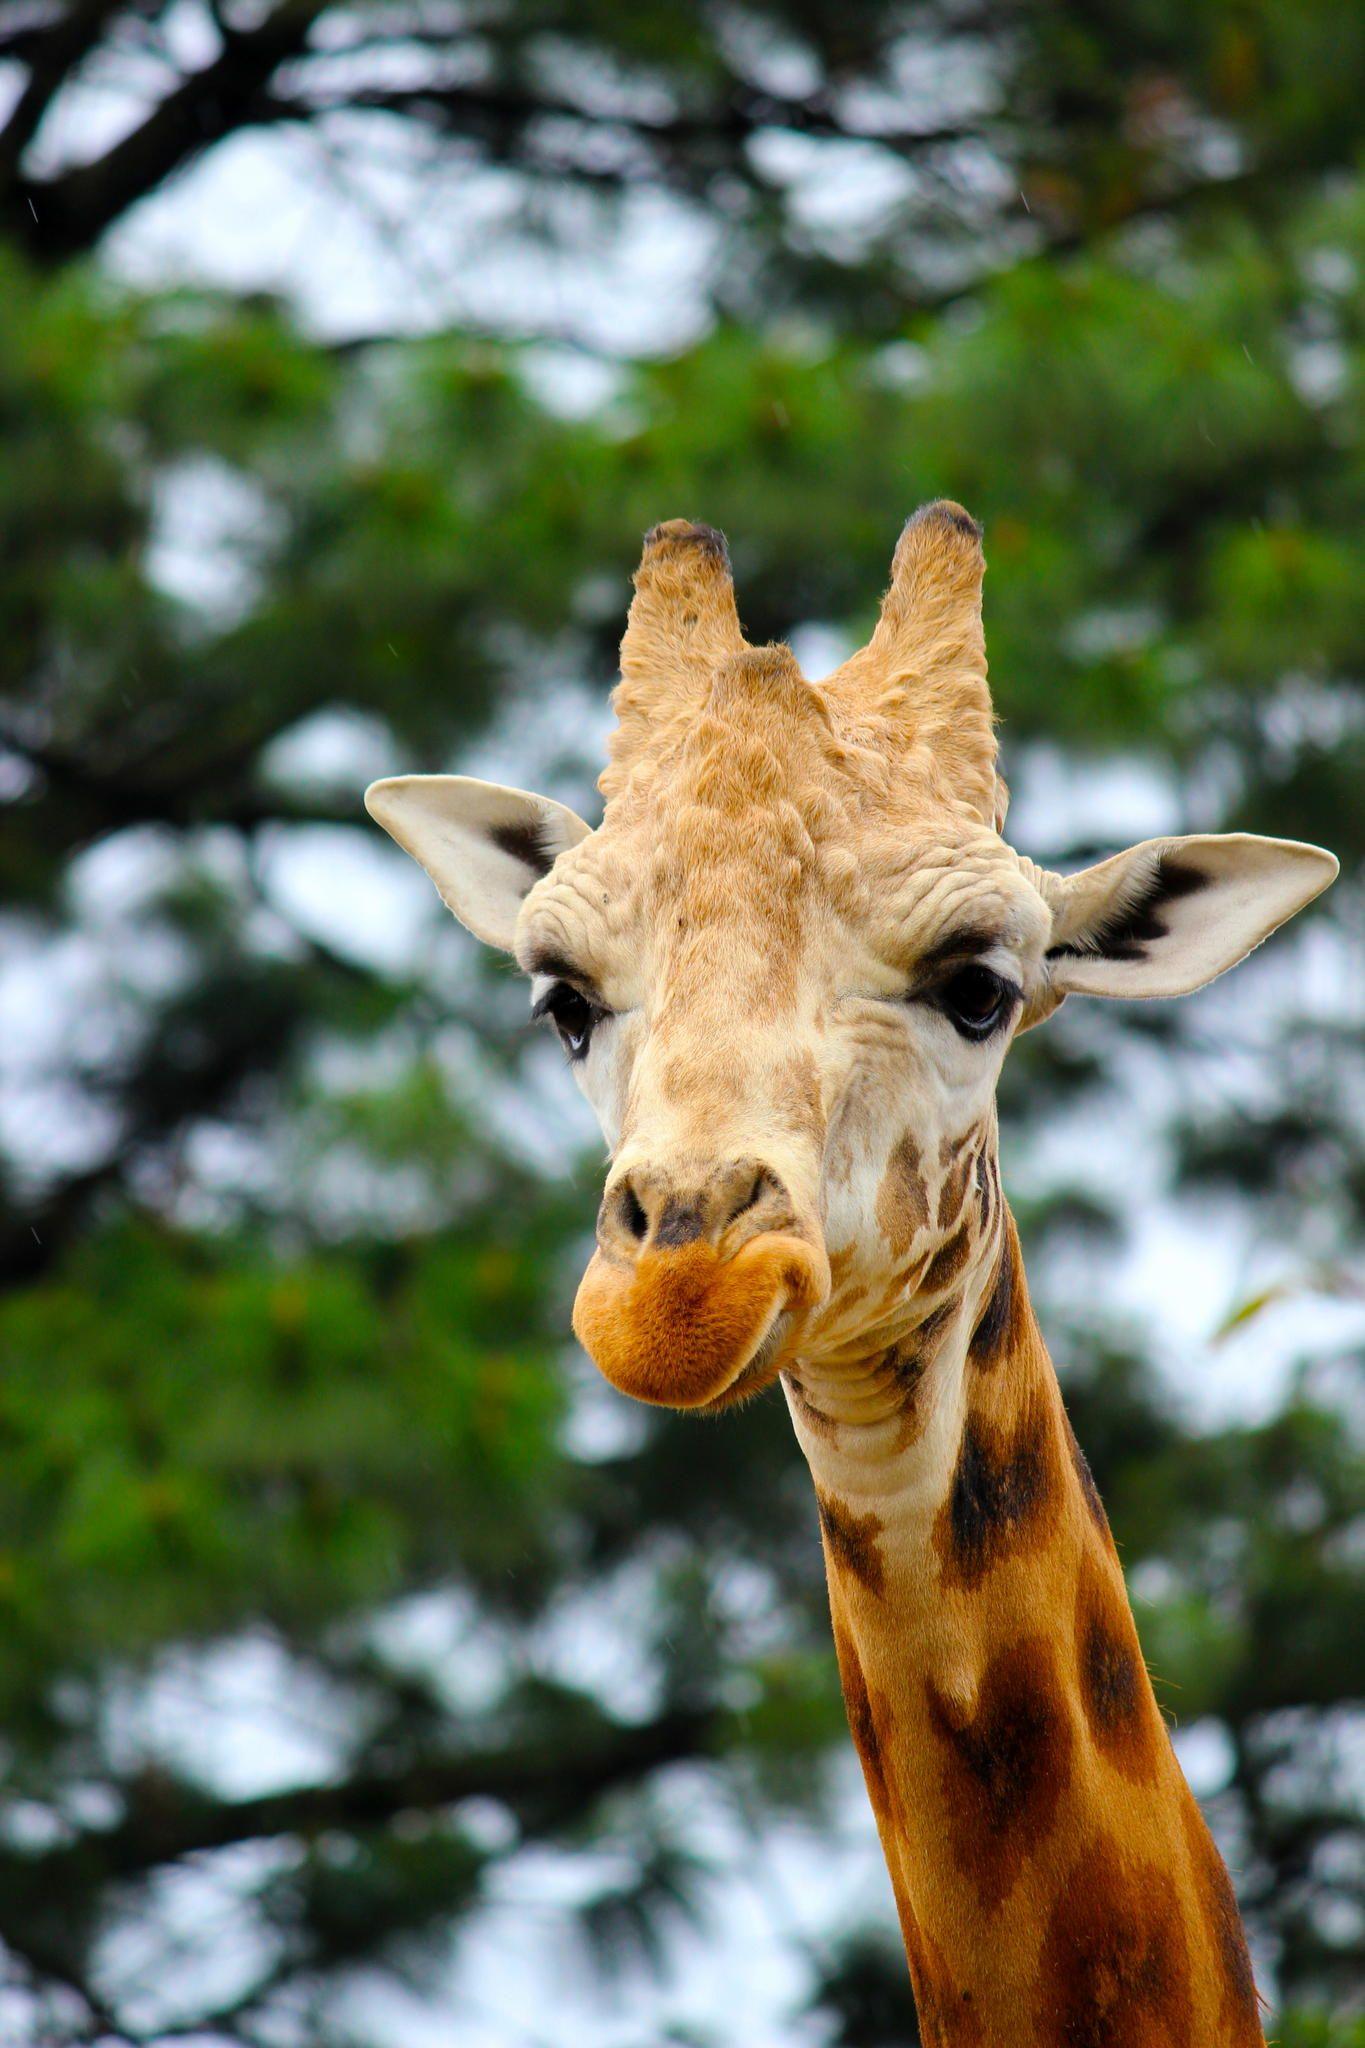 Giraffe by David Rojas on 500px